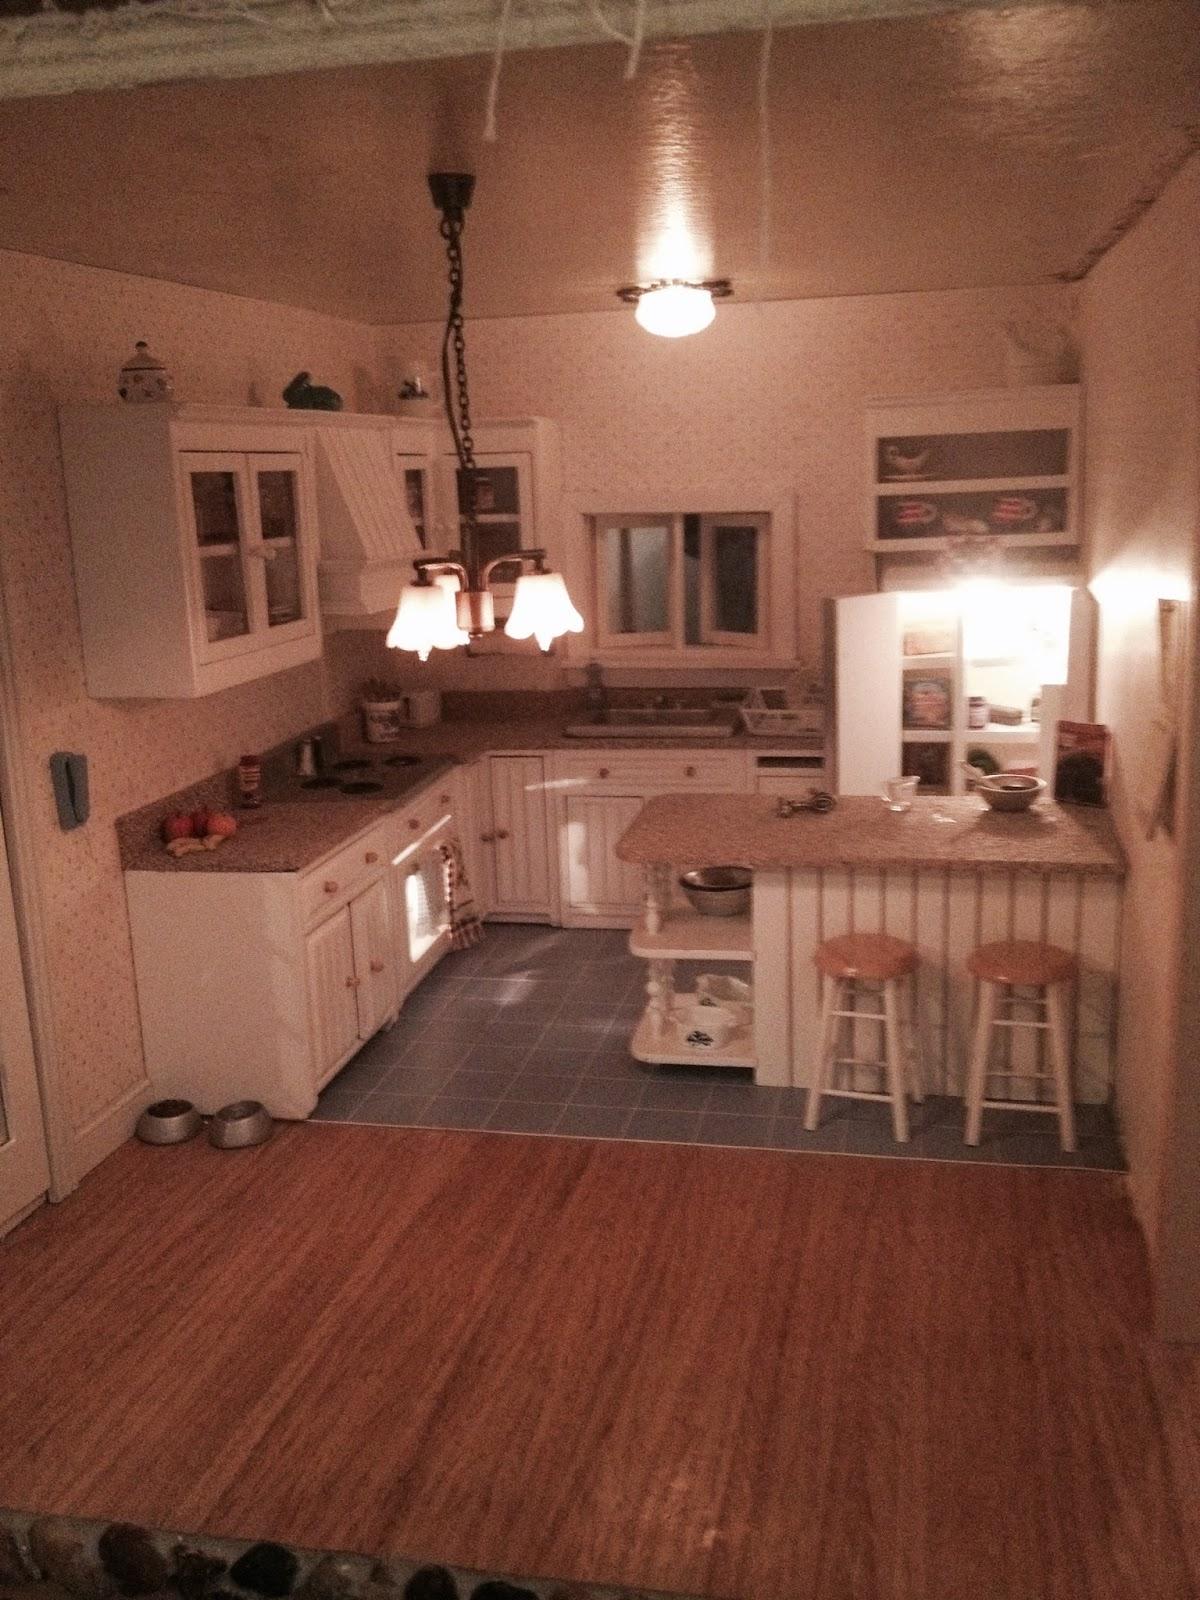 Honey I Shrunk The House Making Glenwood Great Again